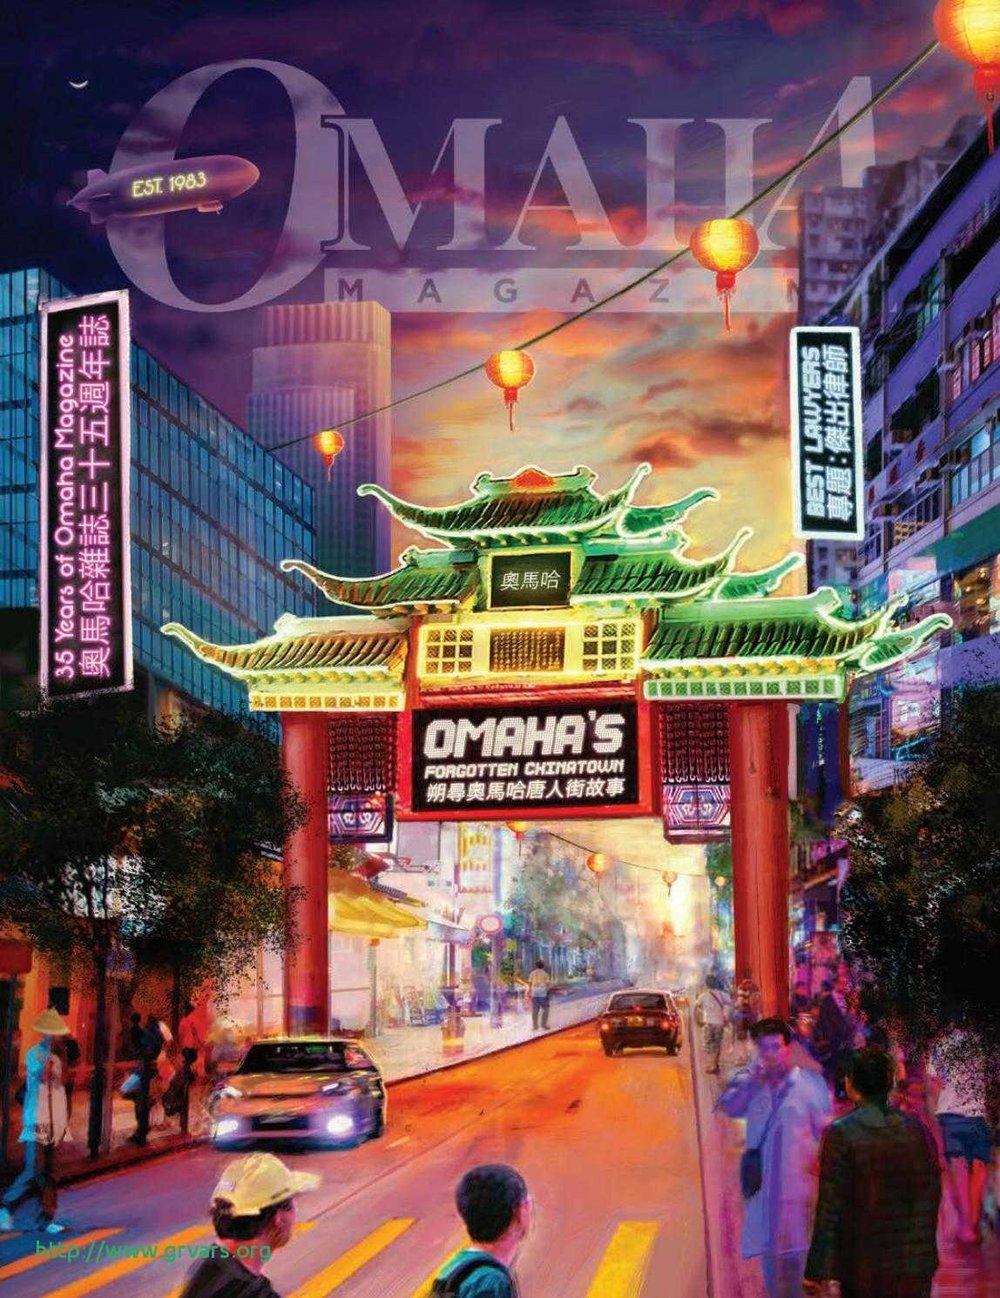 1441-broadway-3rd-floor-nouveau-march-april-2018-omaha-magazine-by-omaha-magazine-issuu-of-1441-broadway-3rd-floor.jpg